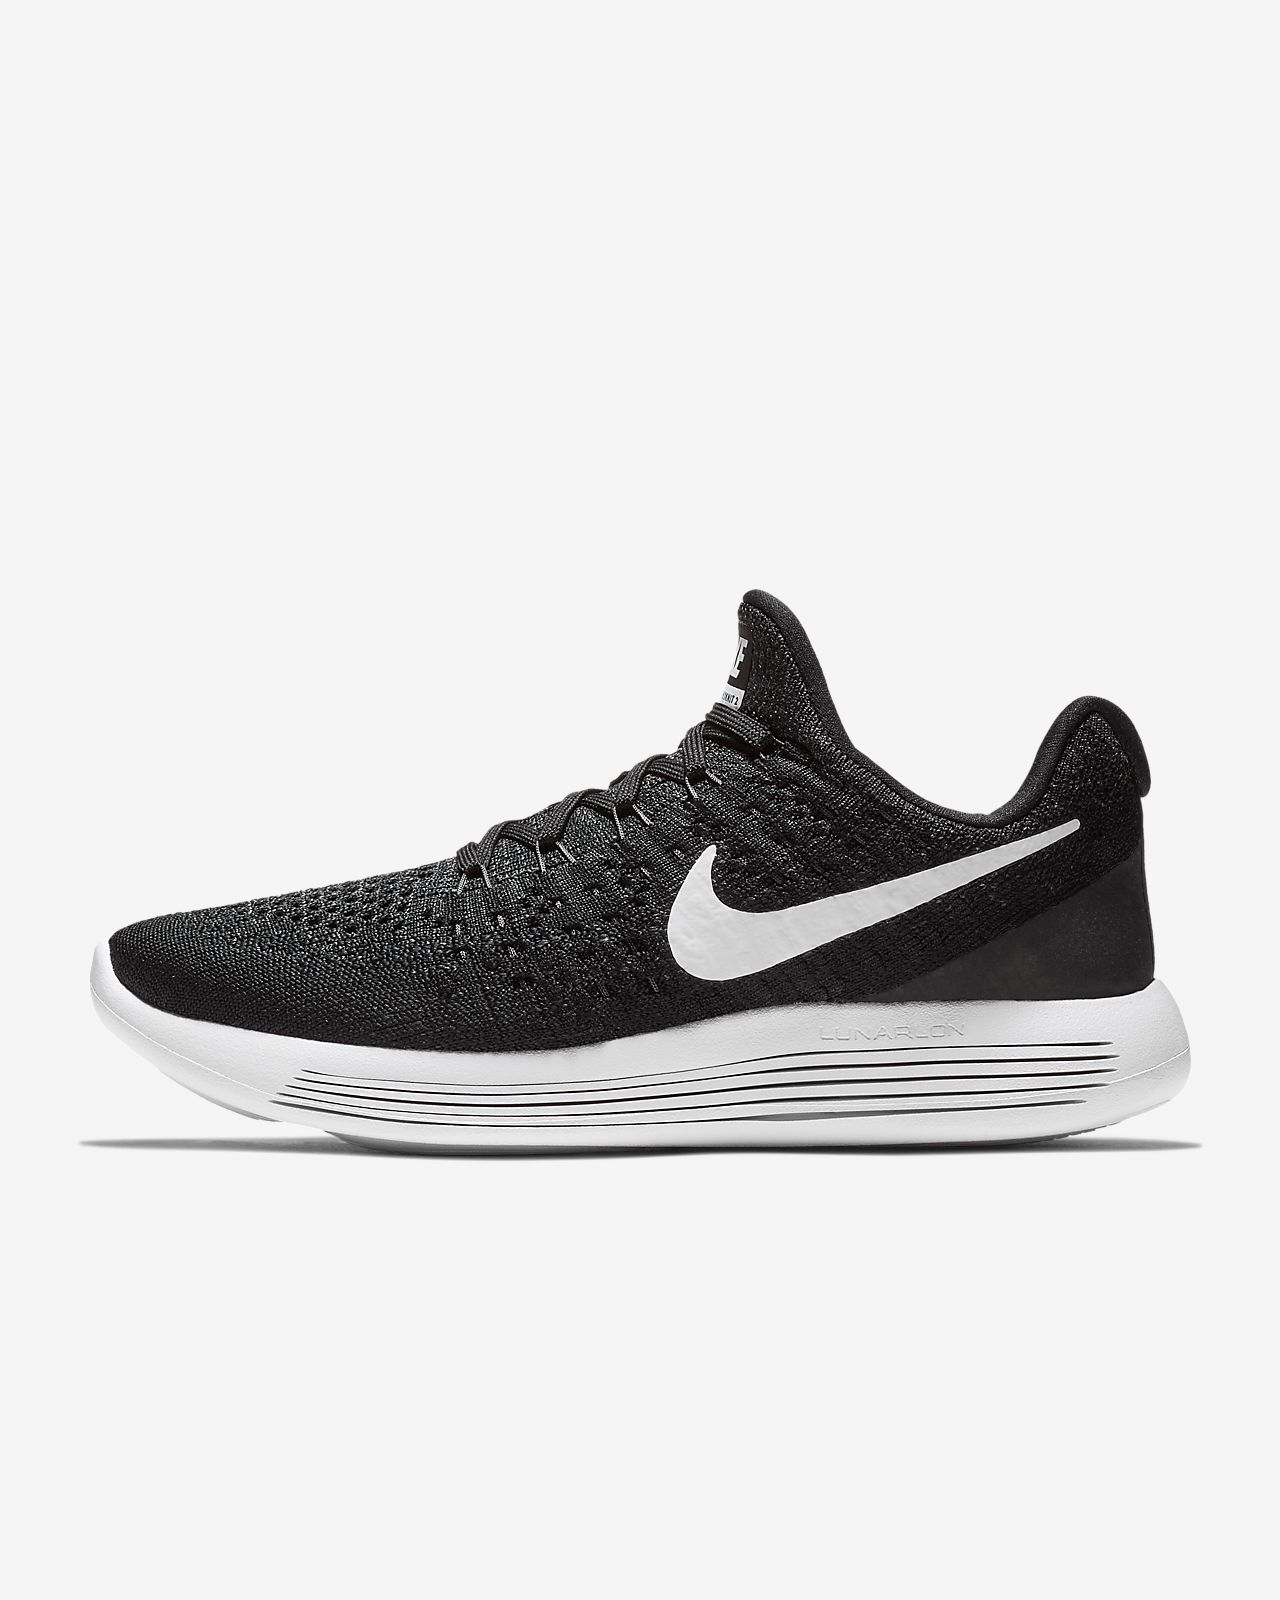 quality design 7ab40 54883 Nike LunarEpic Low Flyknit 2 Women's Running Shoe